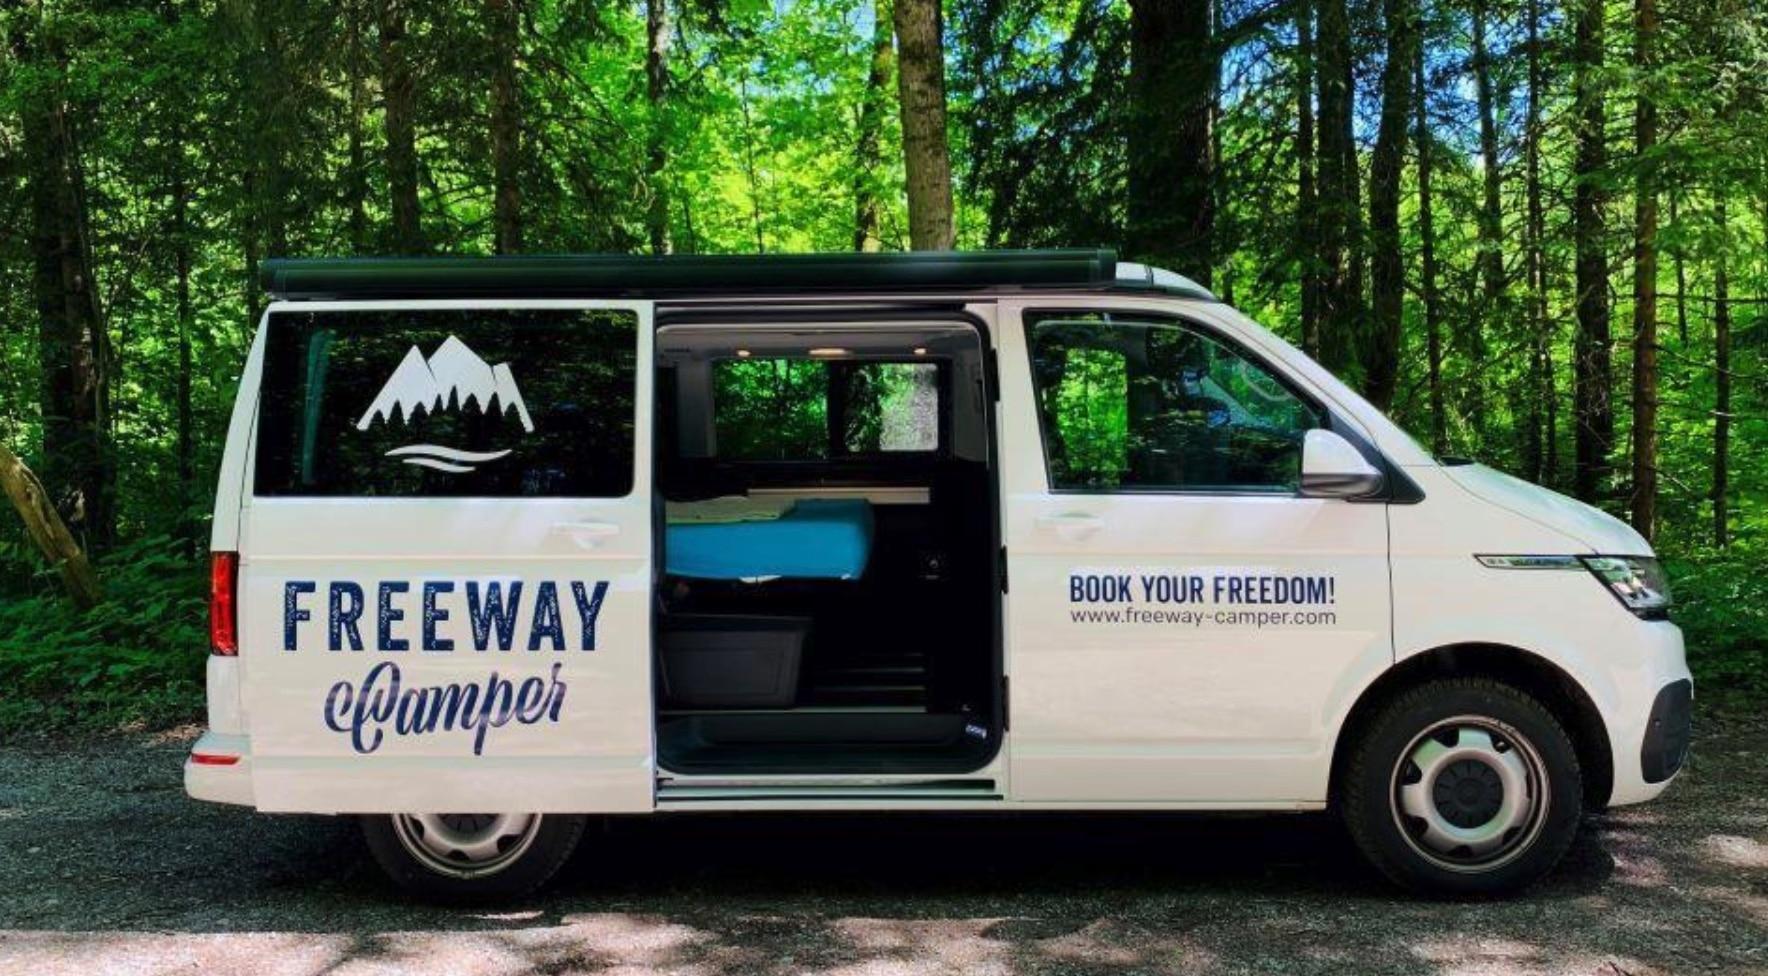 VW T6 freeway camper